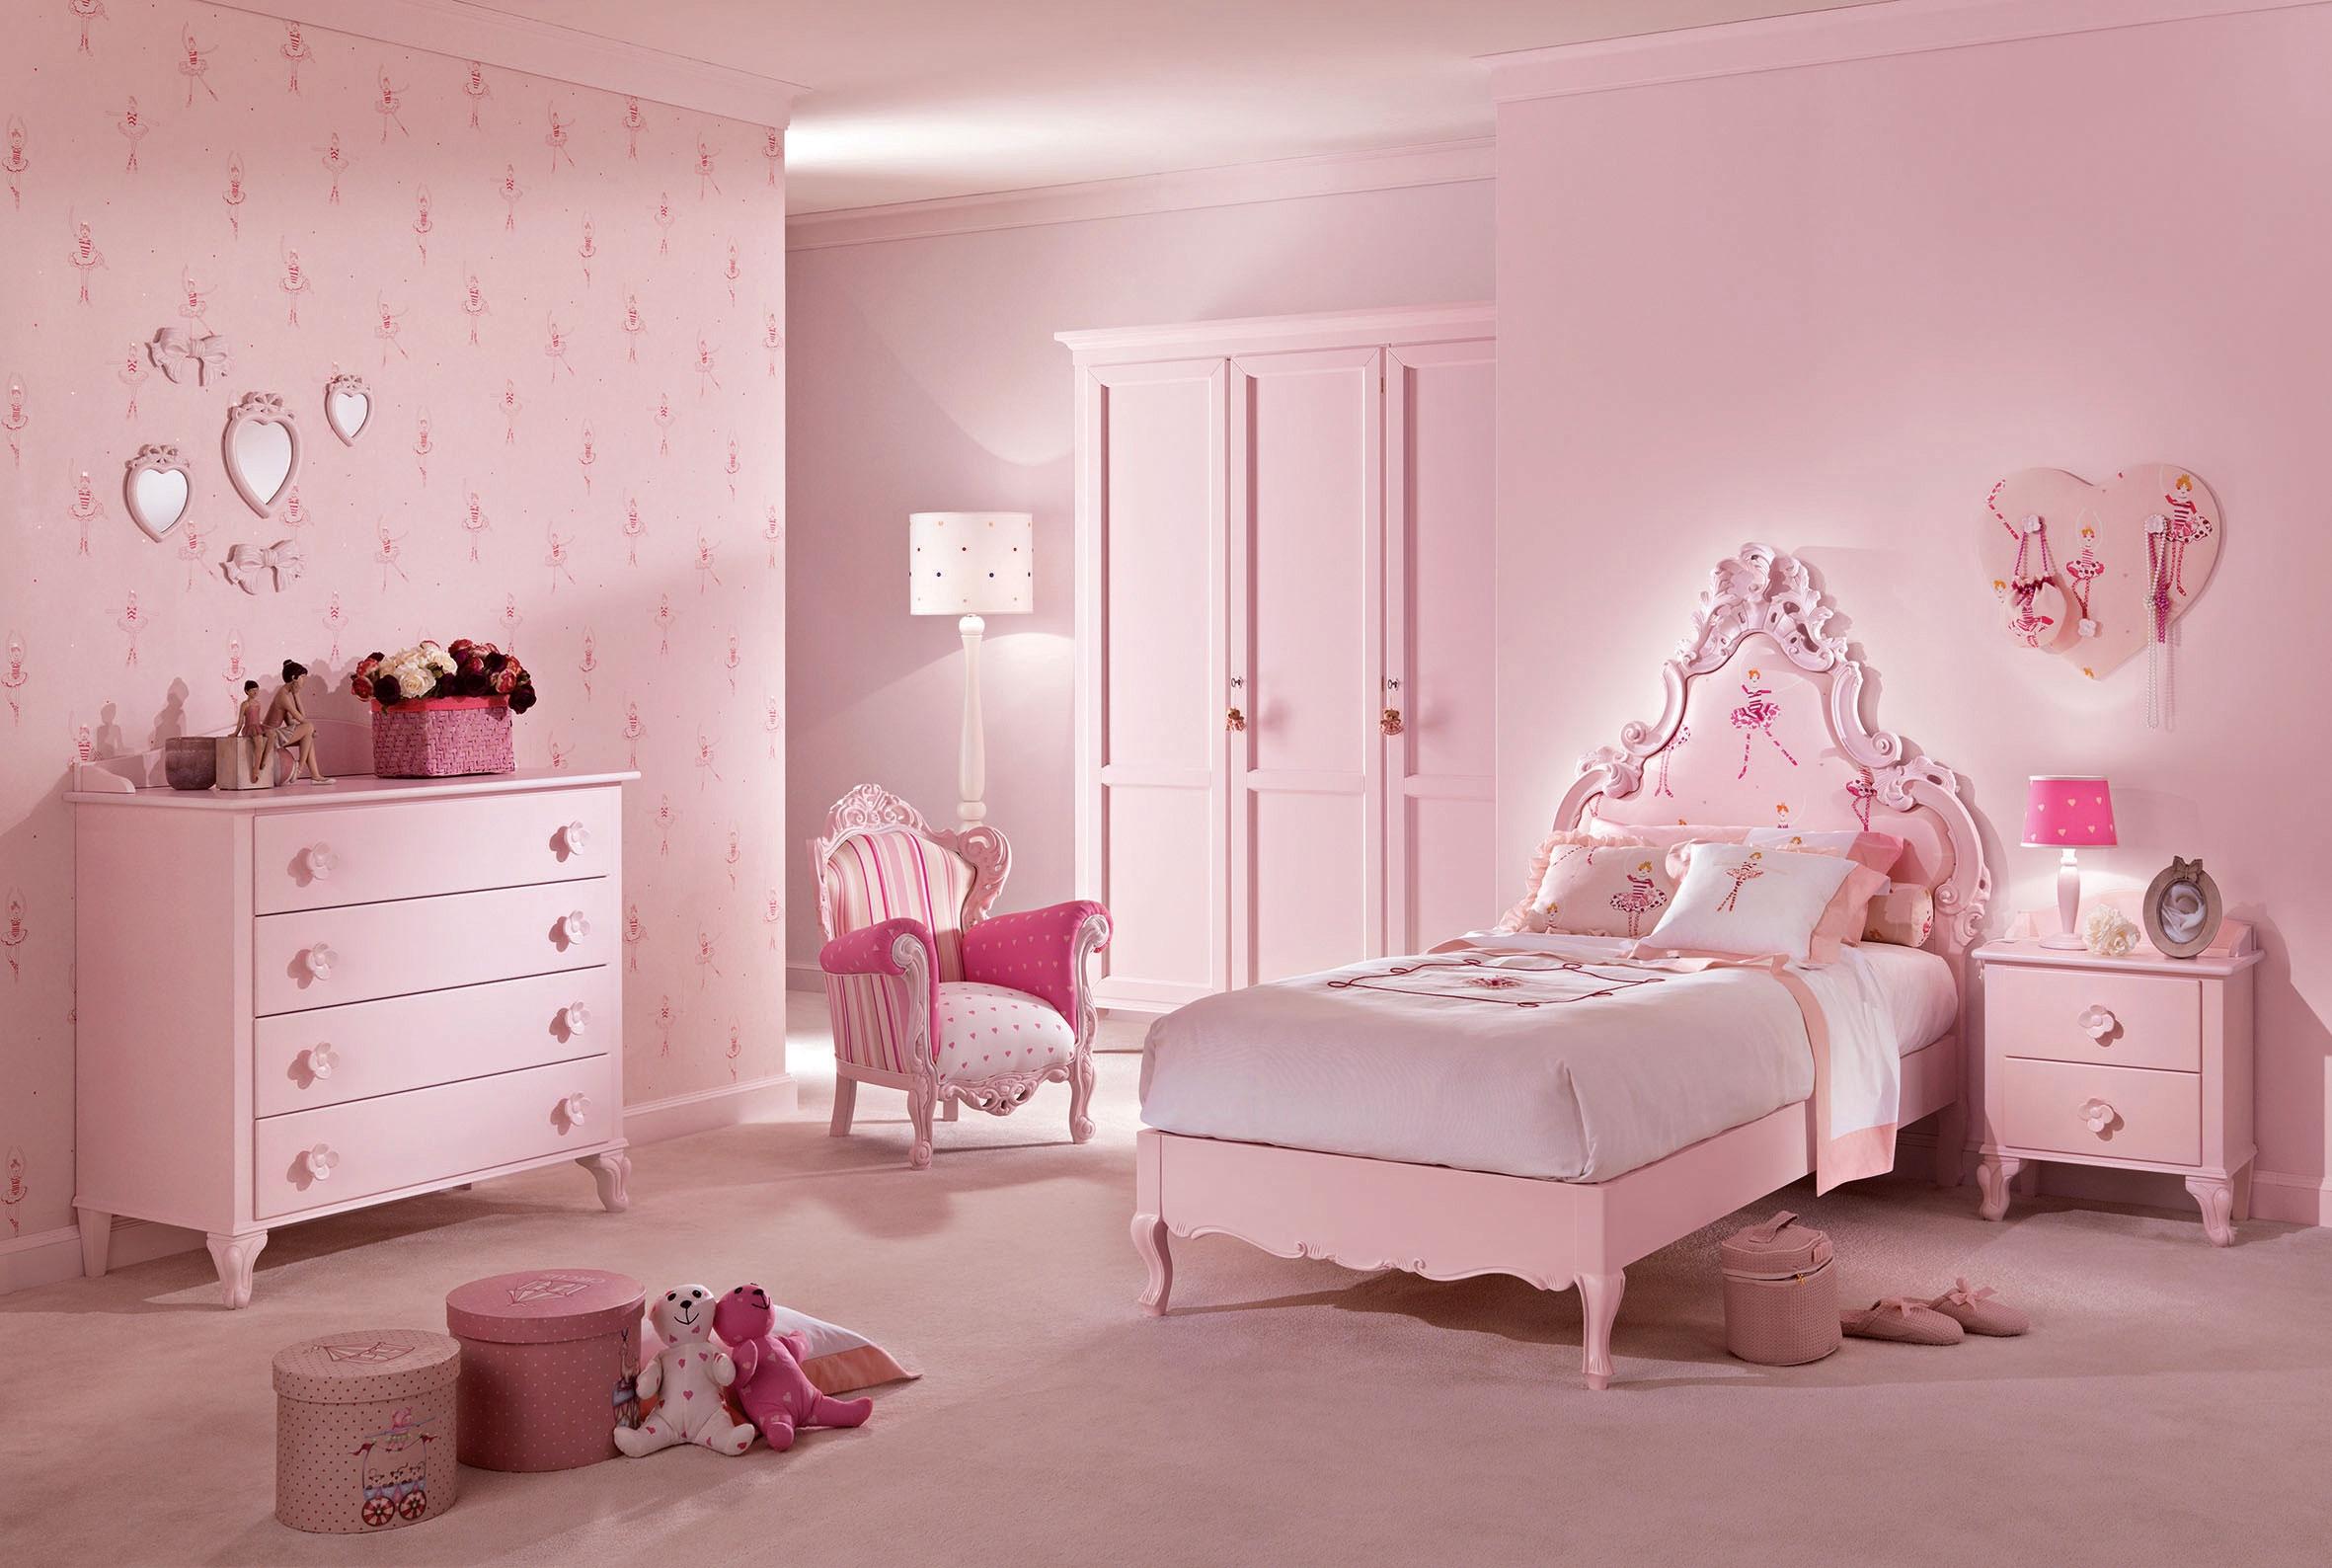 lit princesse modele cecile rose pastel